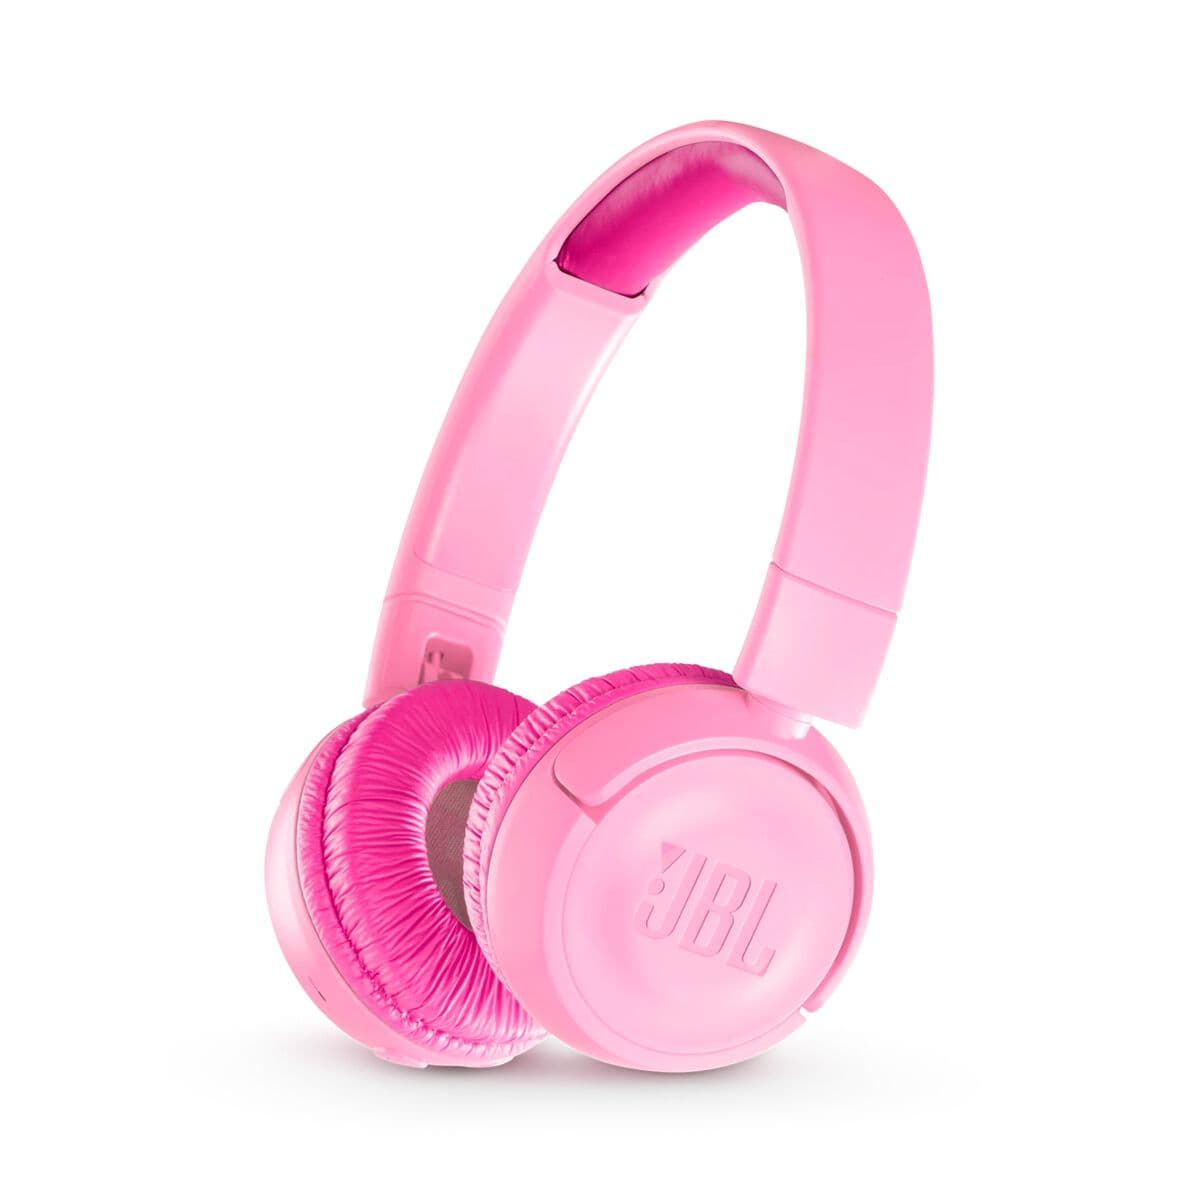 JBL JR300 BT - Pink Casque On-Ear